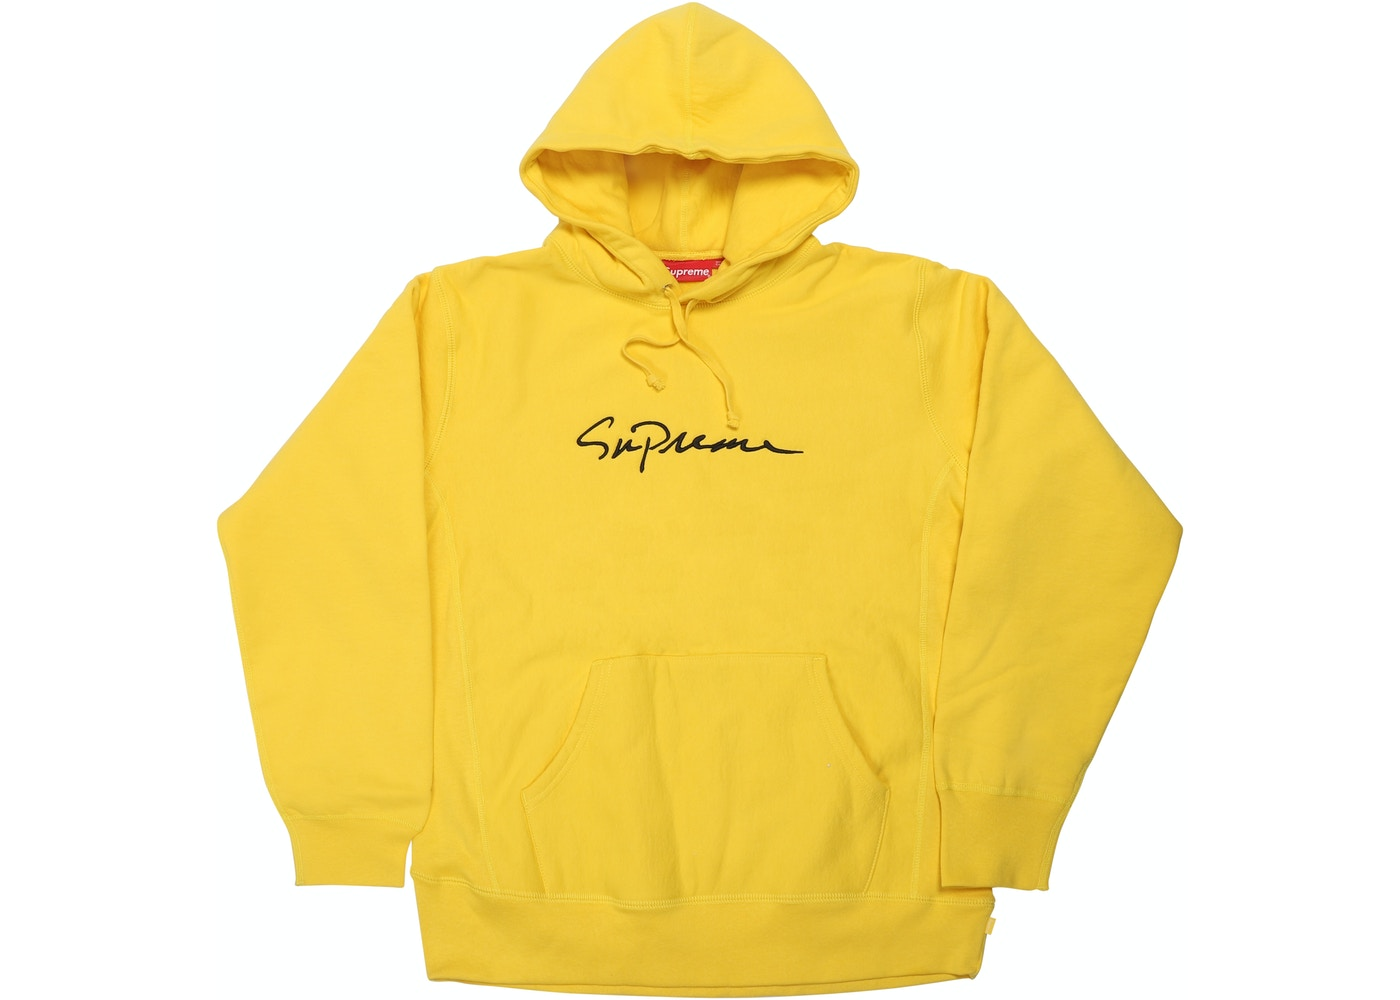 29fc68fc5 Supreme Classic Script Hooded Sweatshirt Yellow - FW18